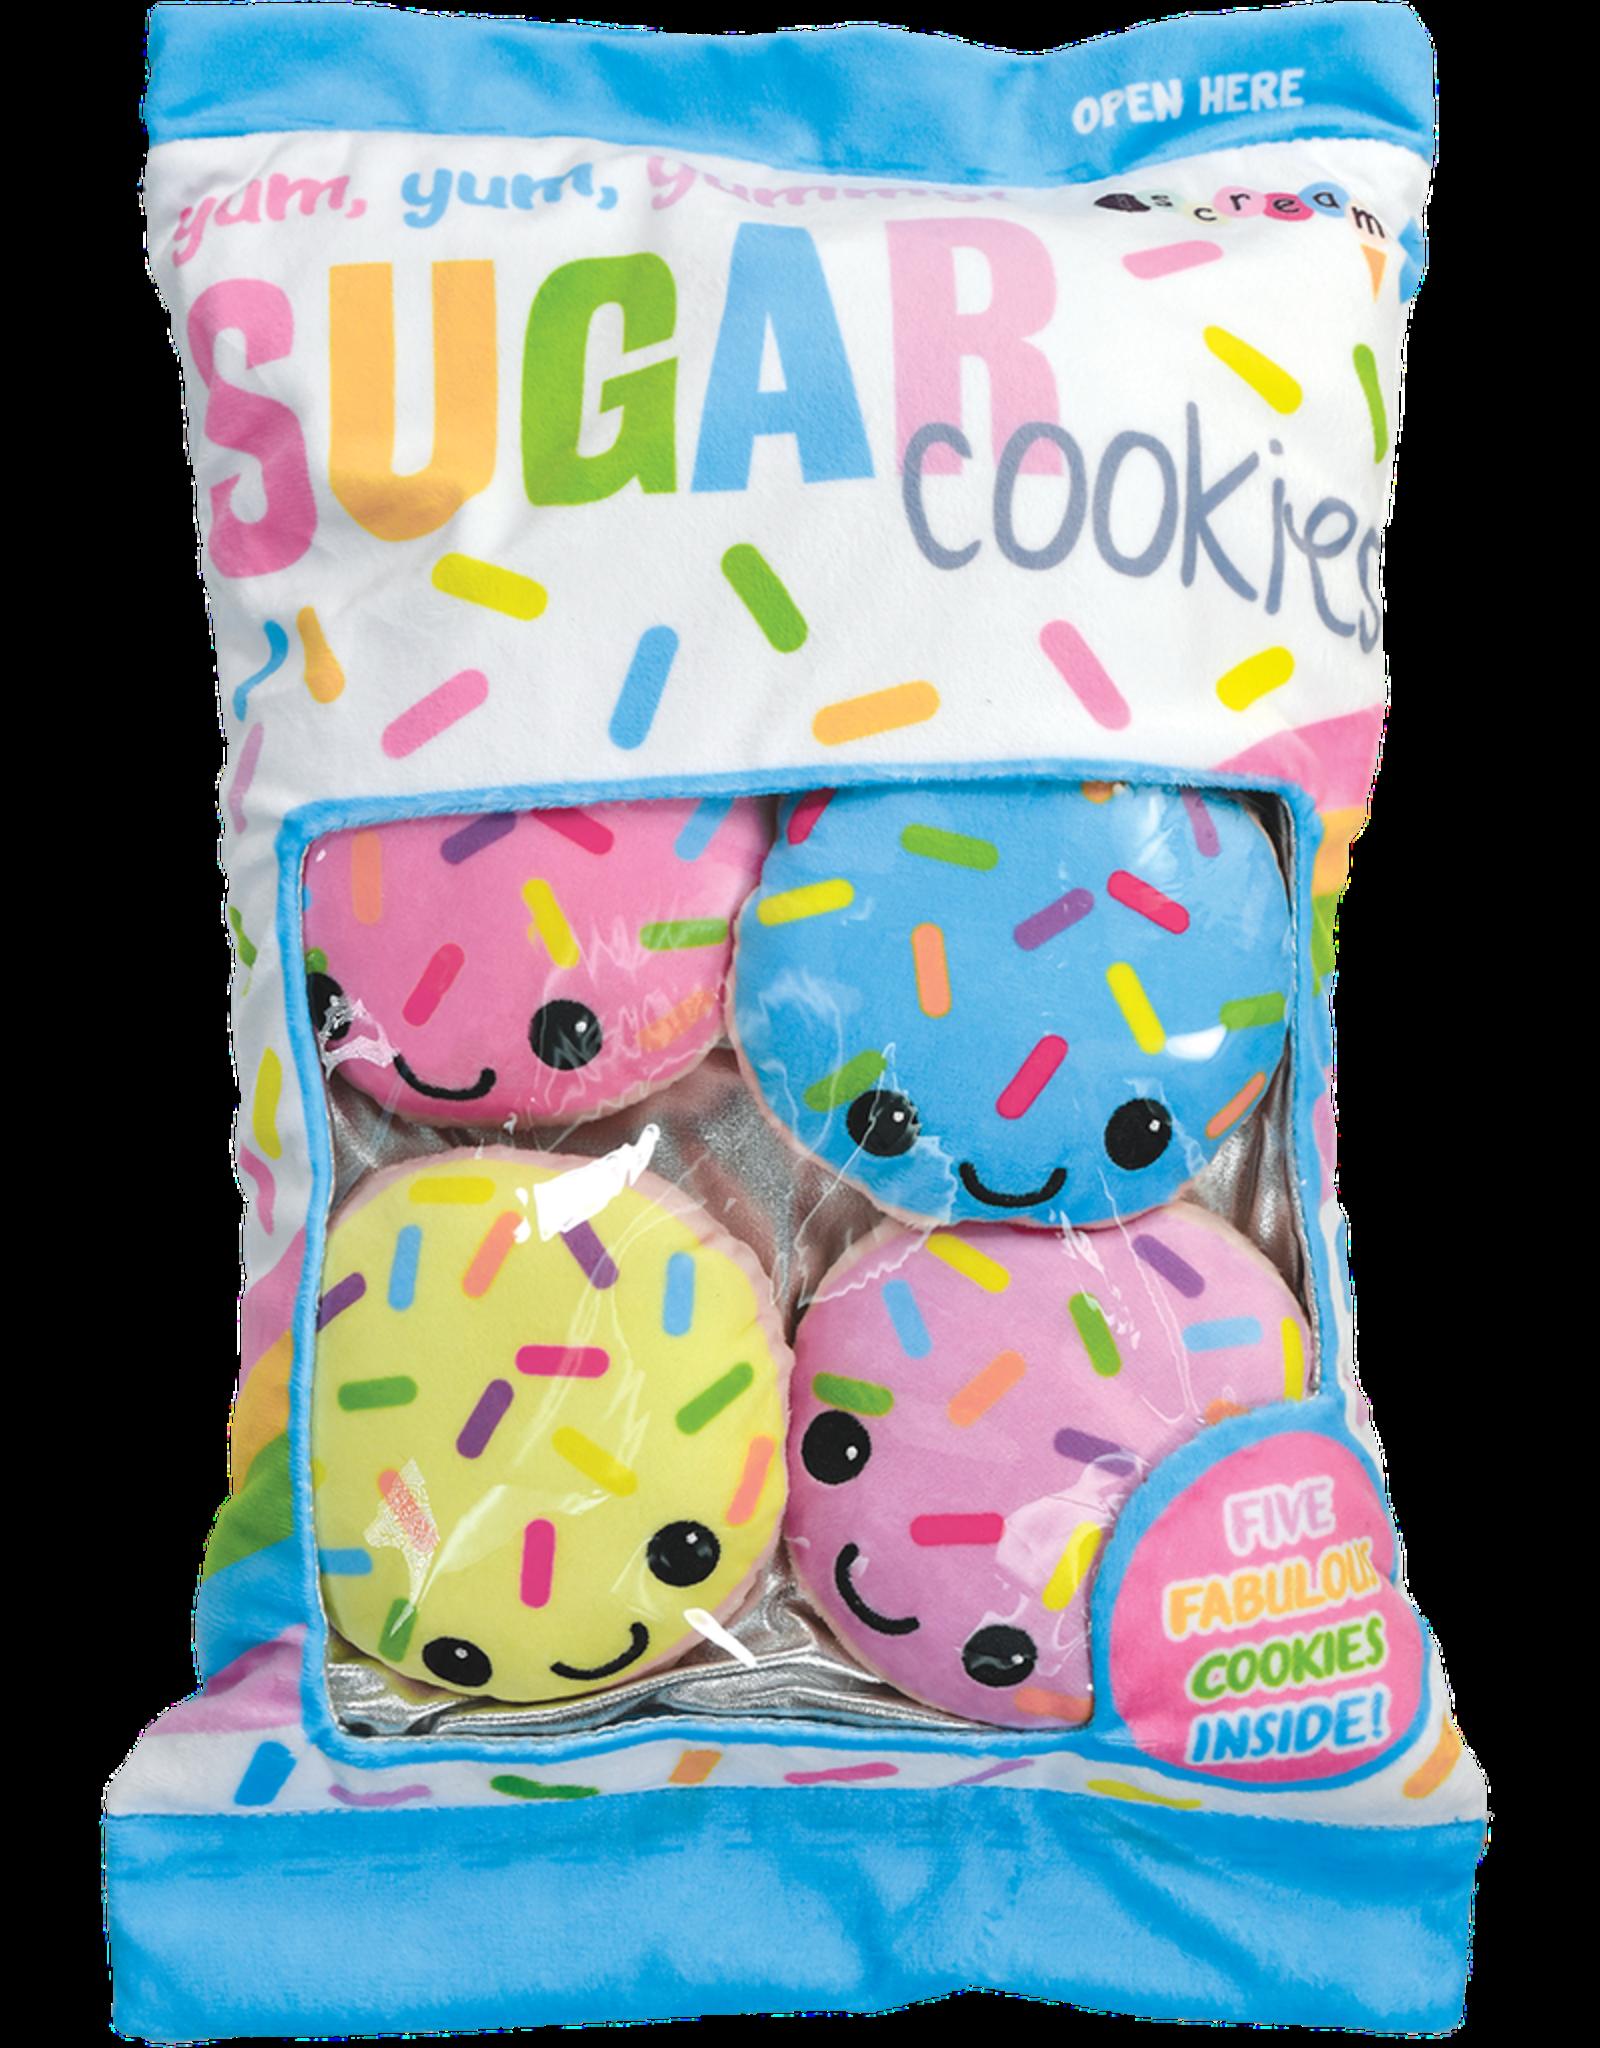 Sugar Cookies Furry and Fleece Plush